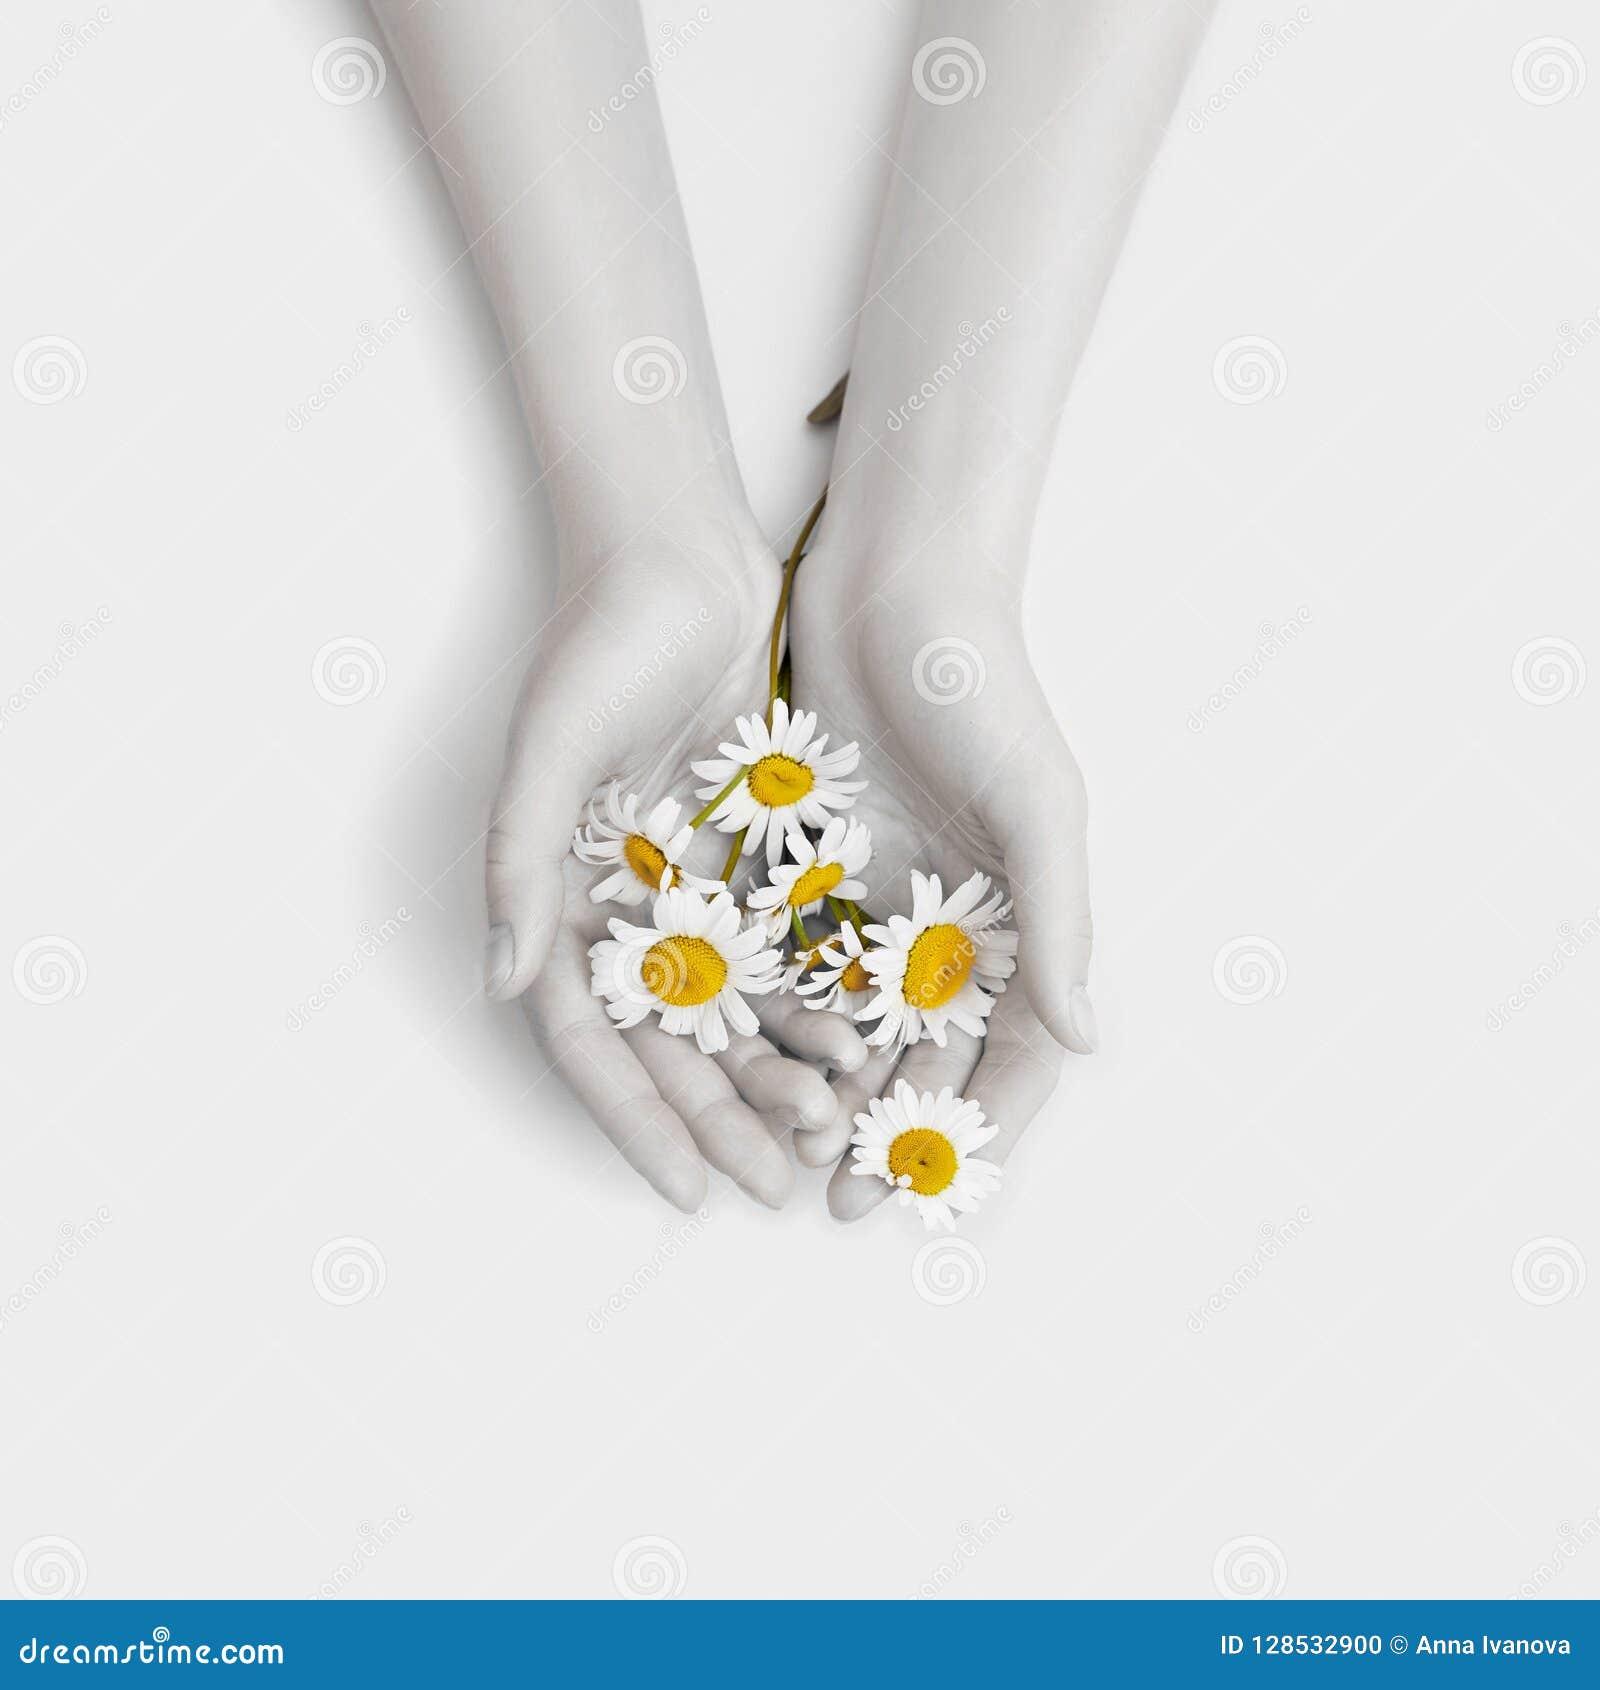 Chamomile φυσικές γυναίκες καλλυντικών τέχνης χεριών μόδας, άσπρο όμορφο chamomile χέρι λουλουδιών με τη φωτεινή αντίθεση makeup,